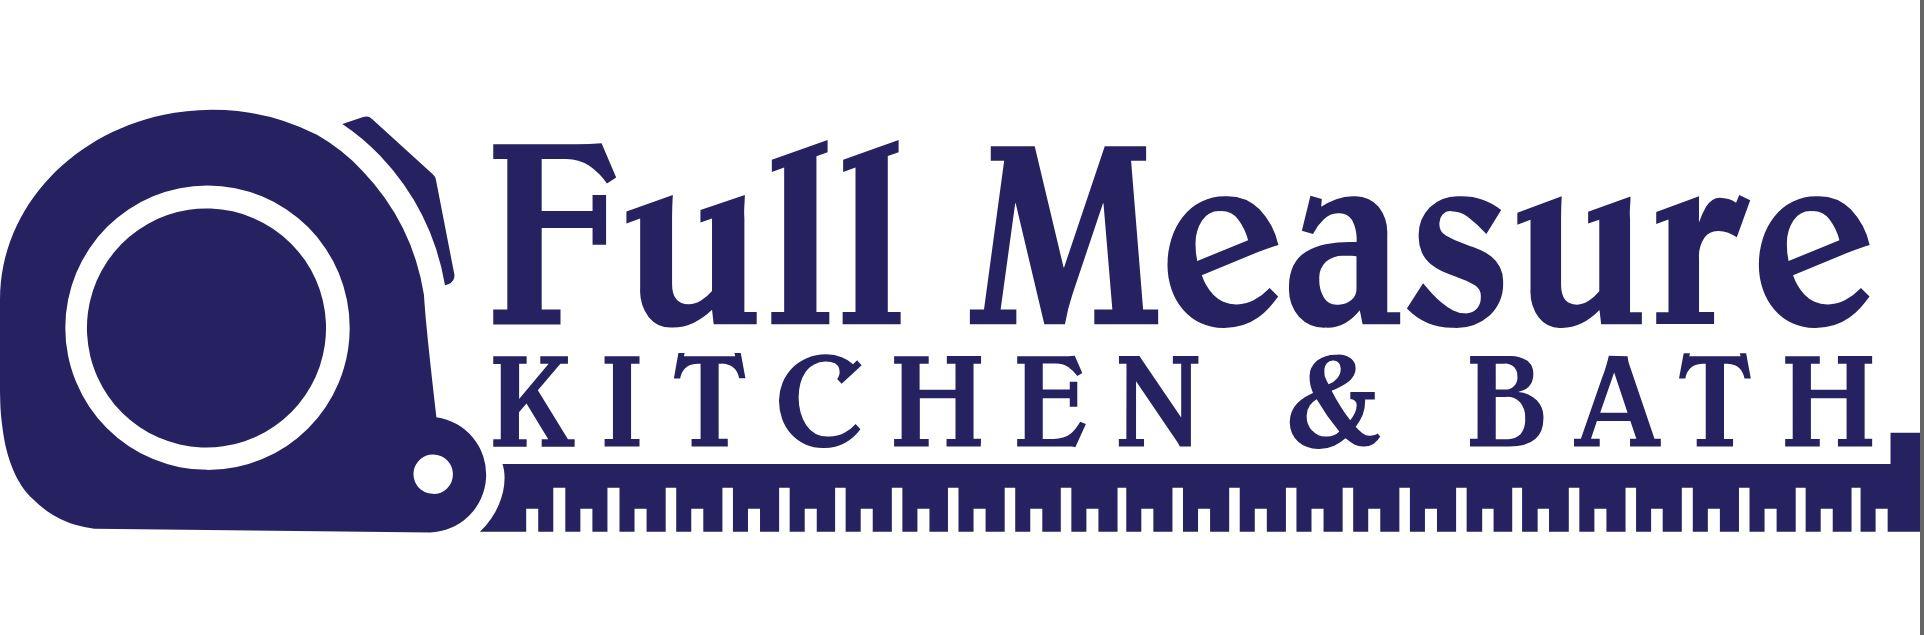 Full Measure Kitchen & Bath